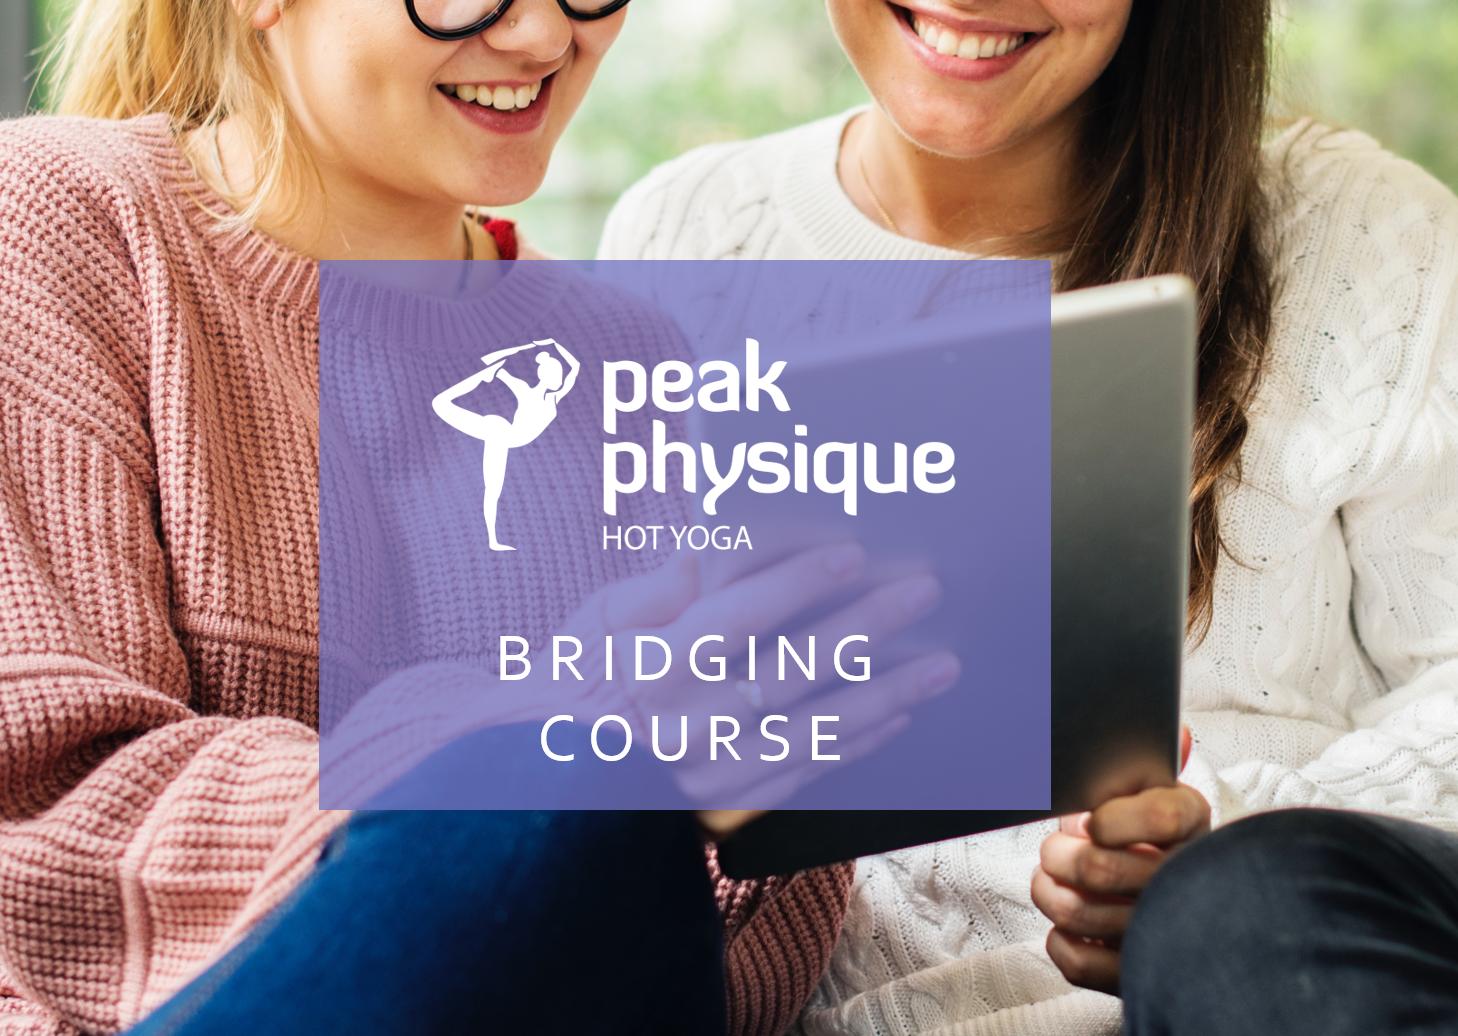 Peak Physique Bridging Course